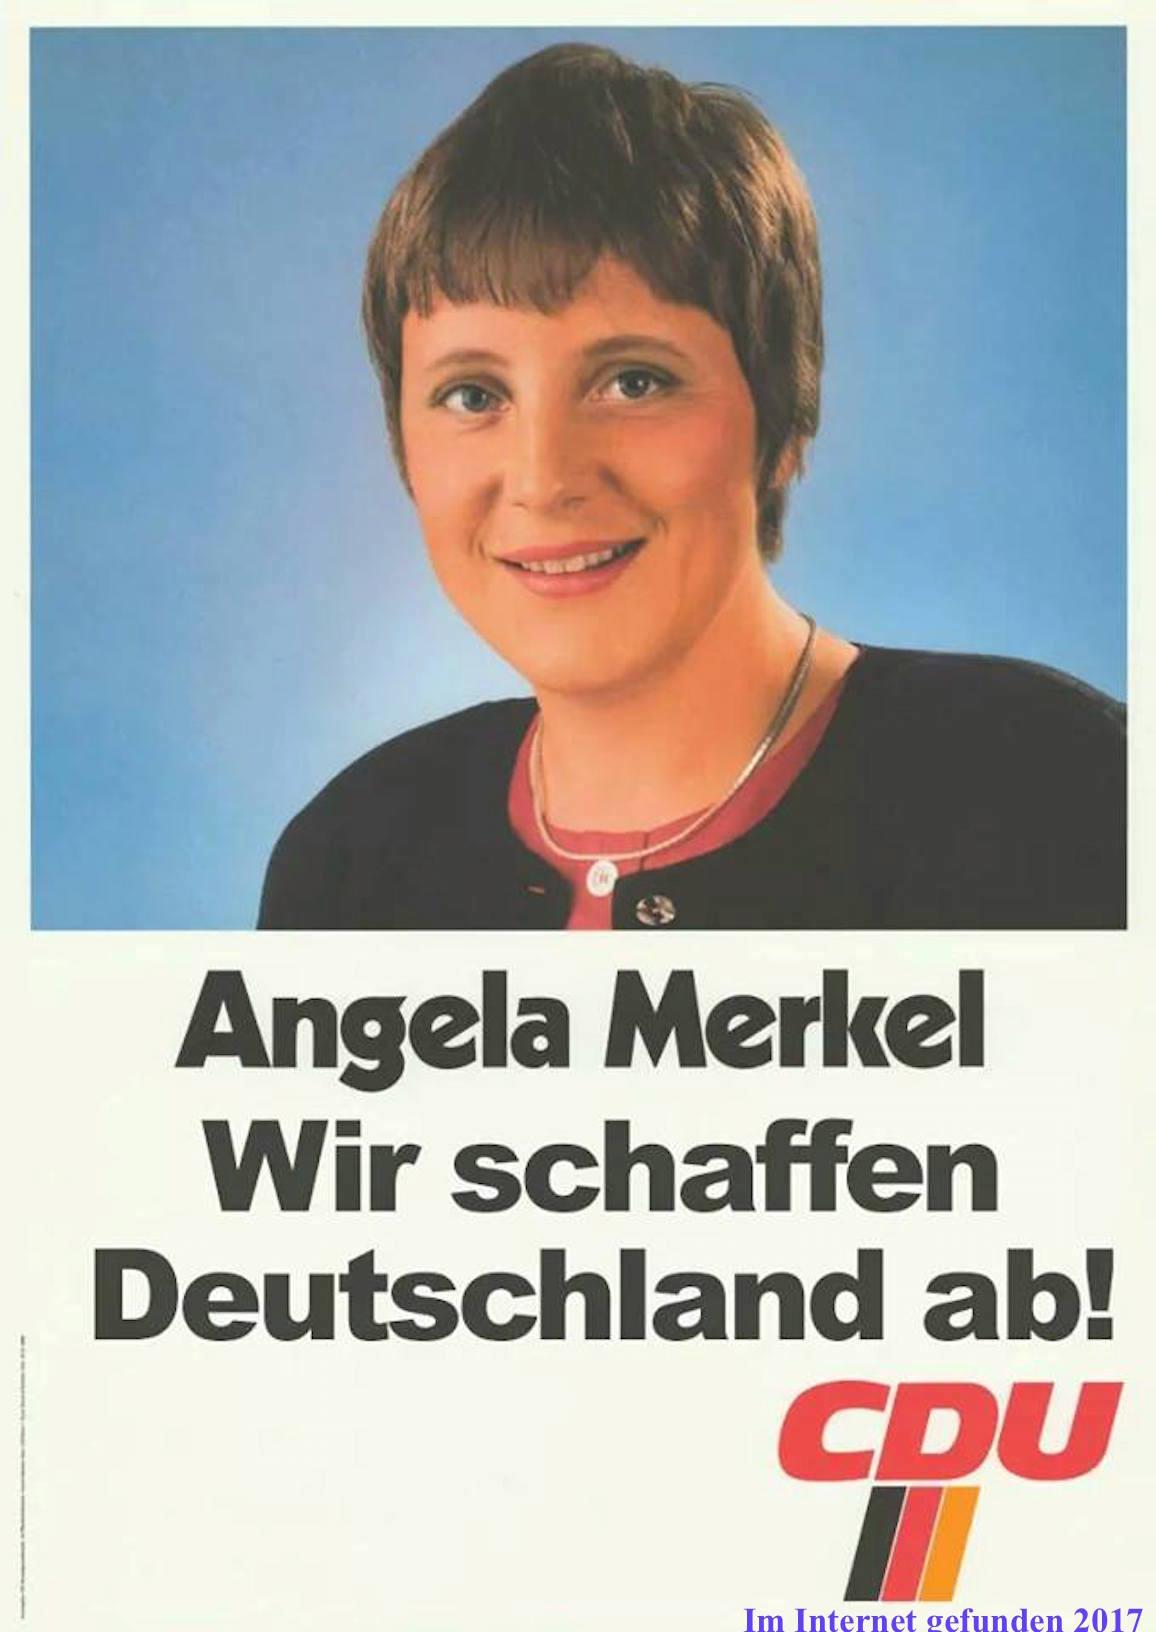 AMerkel WahlSlogan 2017